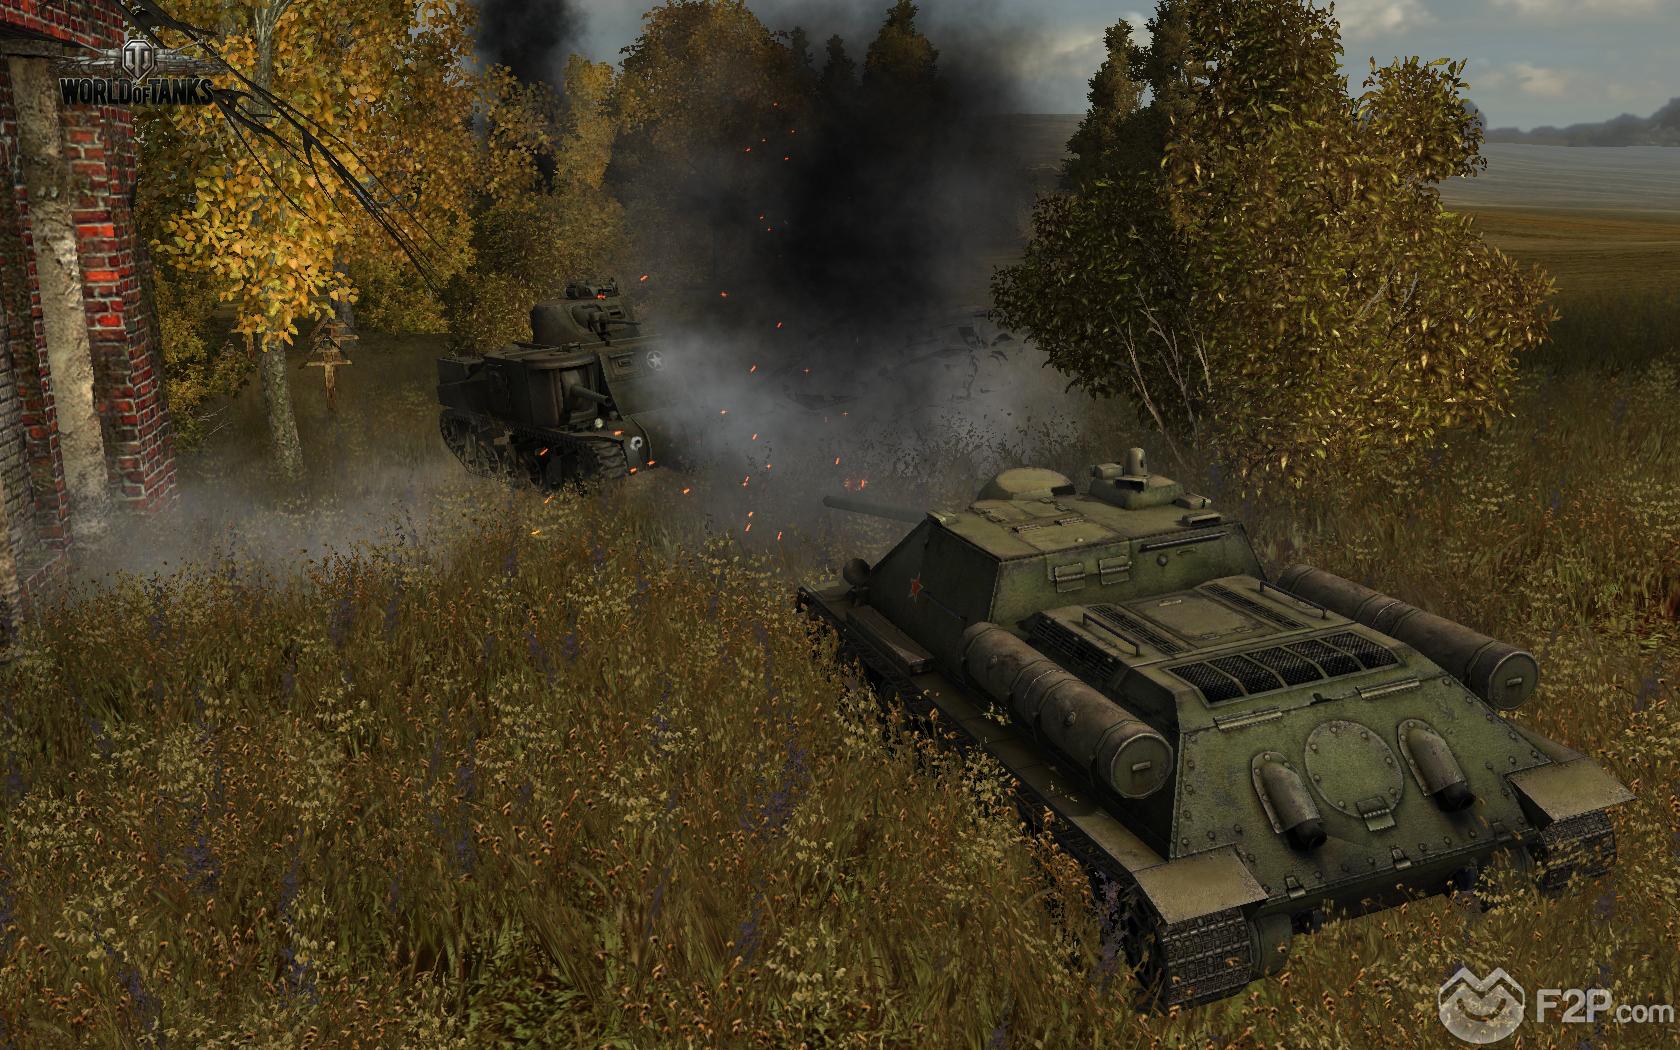 Click image for larger version.Name:World of Tanks 61.jpgViews:124Size:1.82 MBID:3854